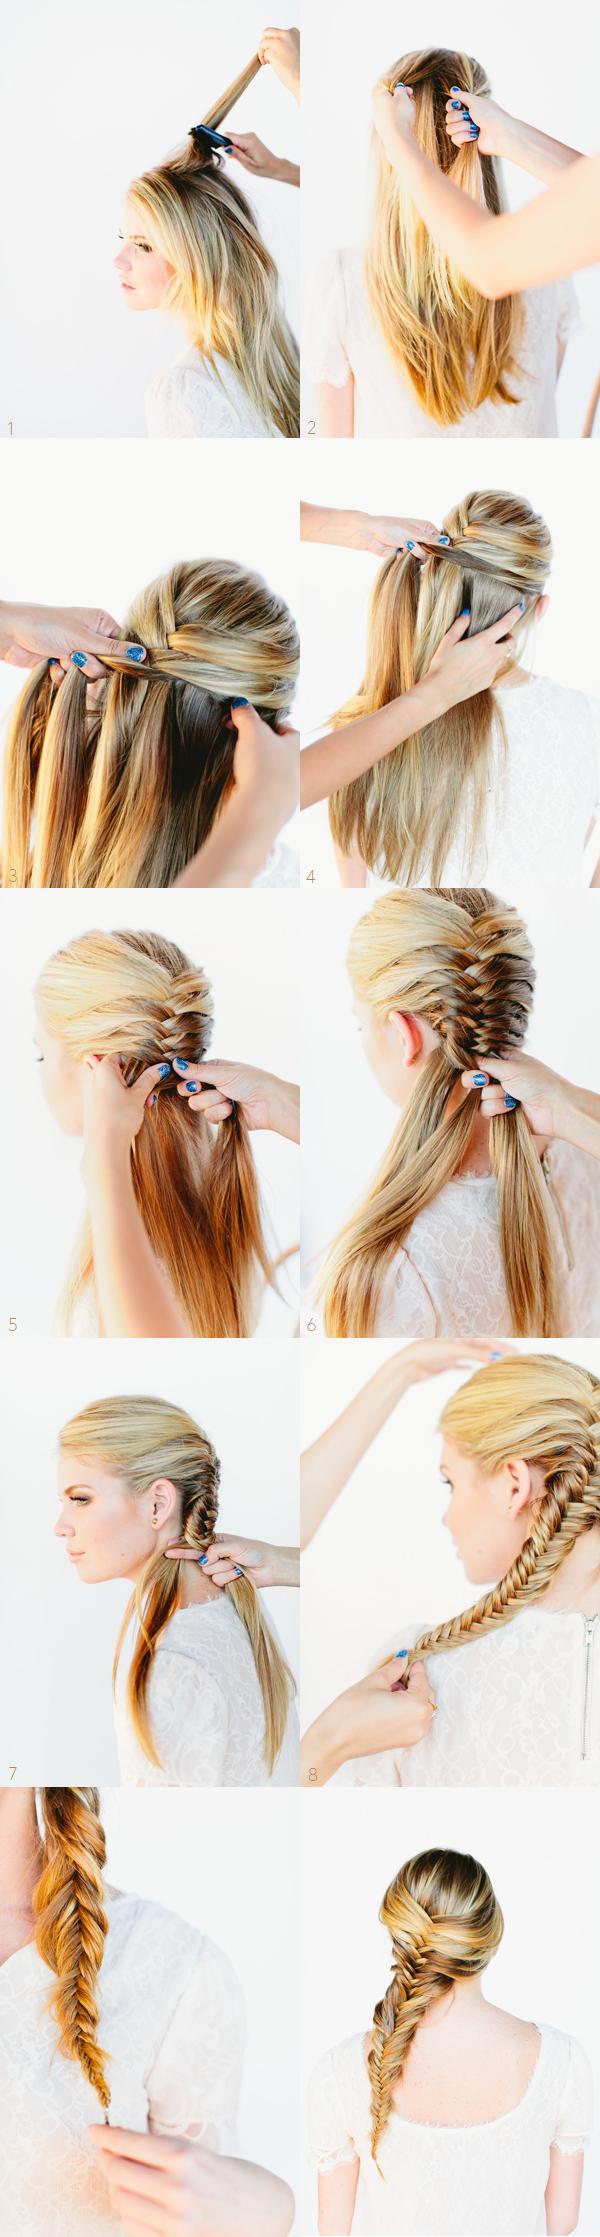 16. FISHTAIL BRAID HAIR